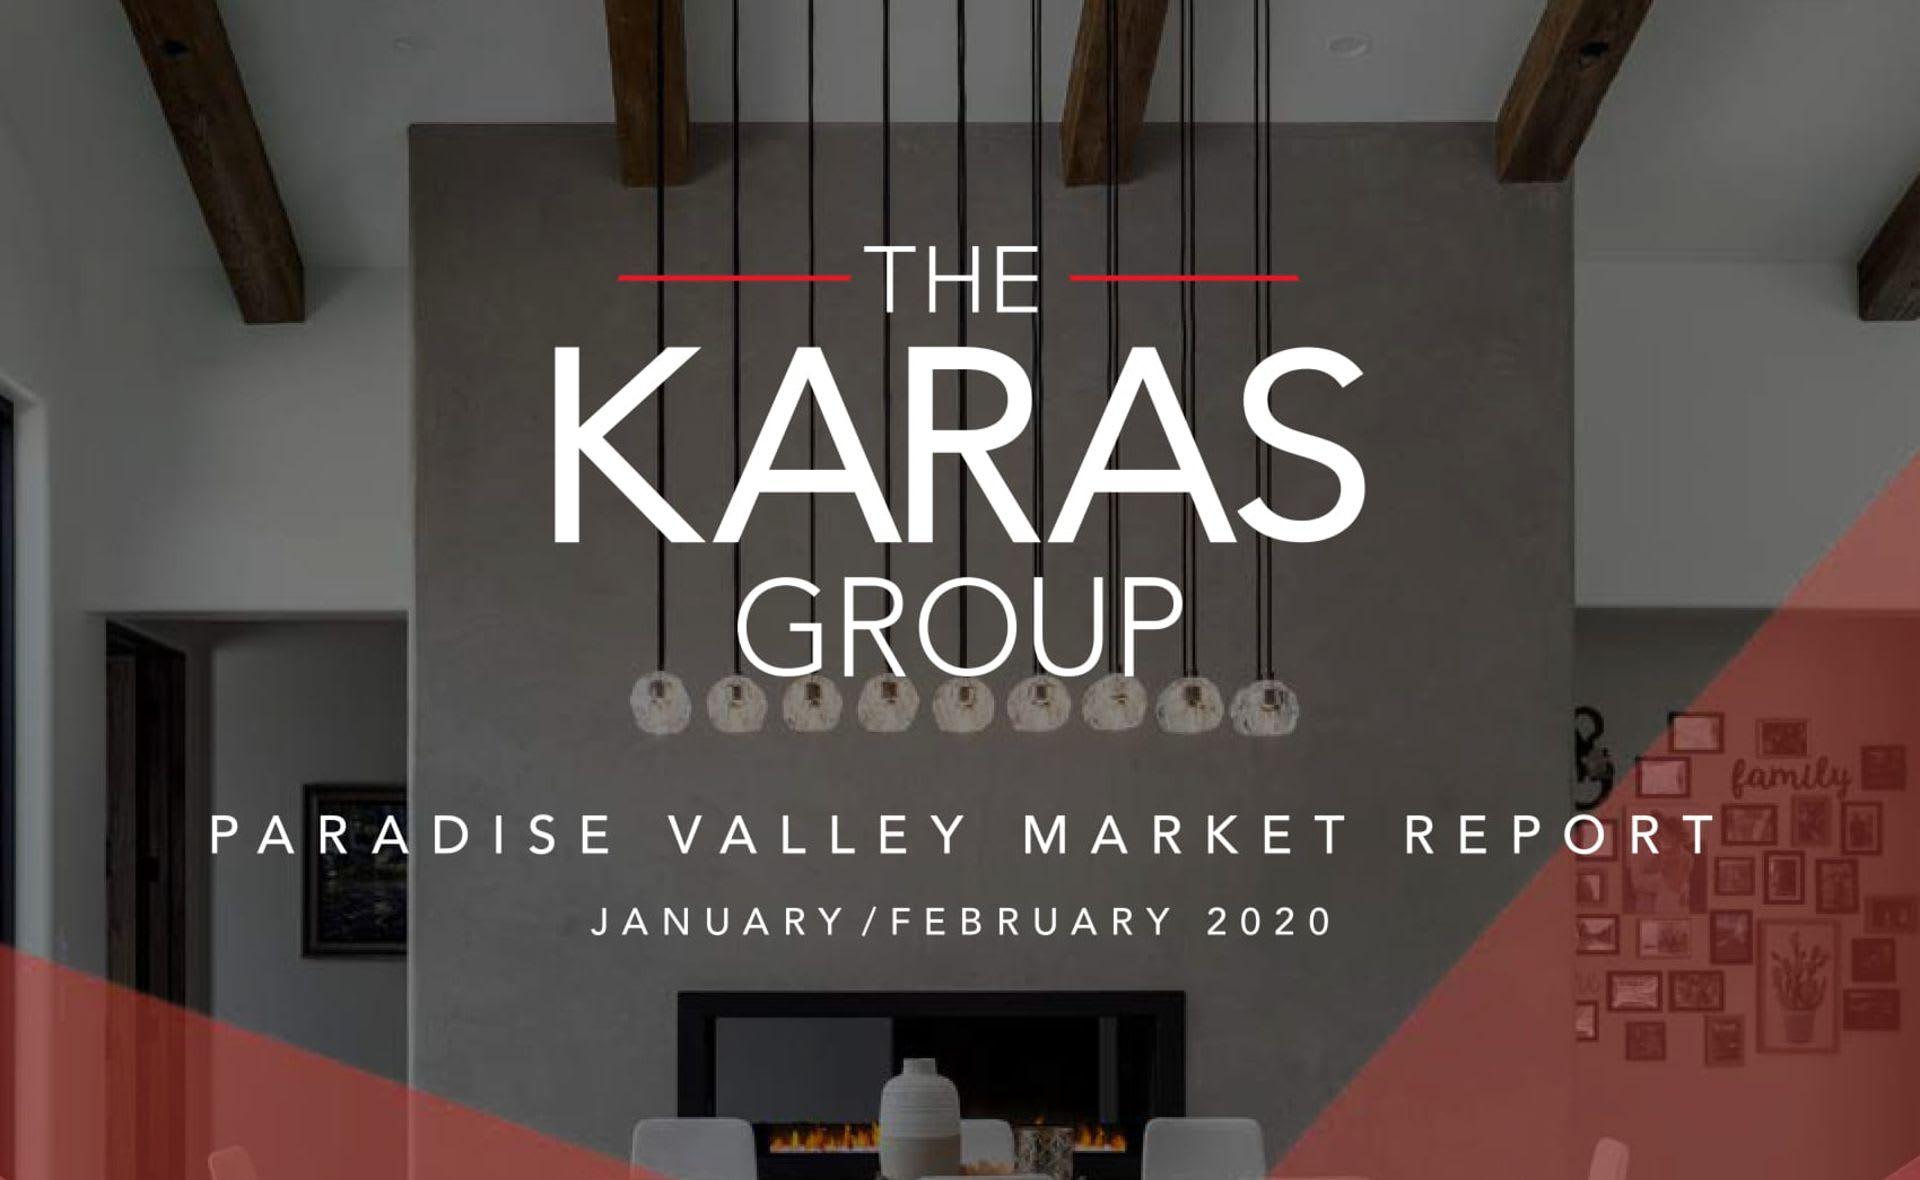 The Karas Group Paradise Valley Market Report (January - February 2020)